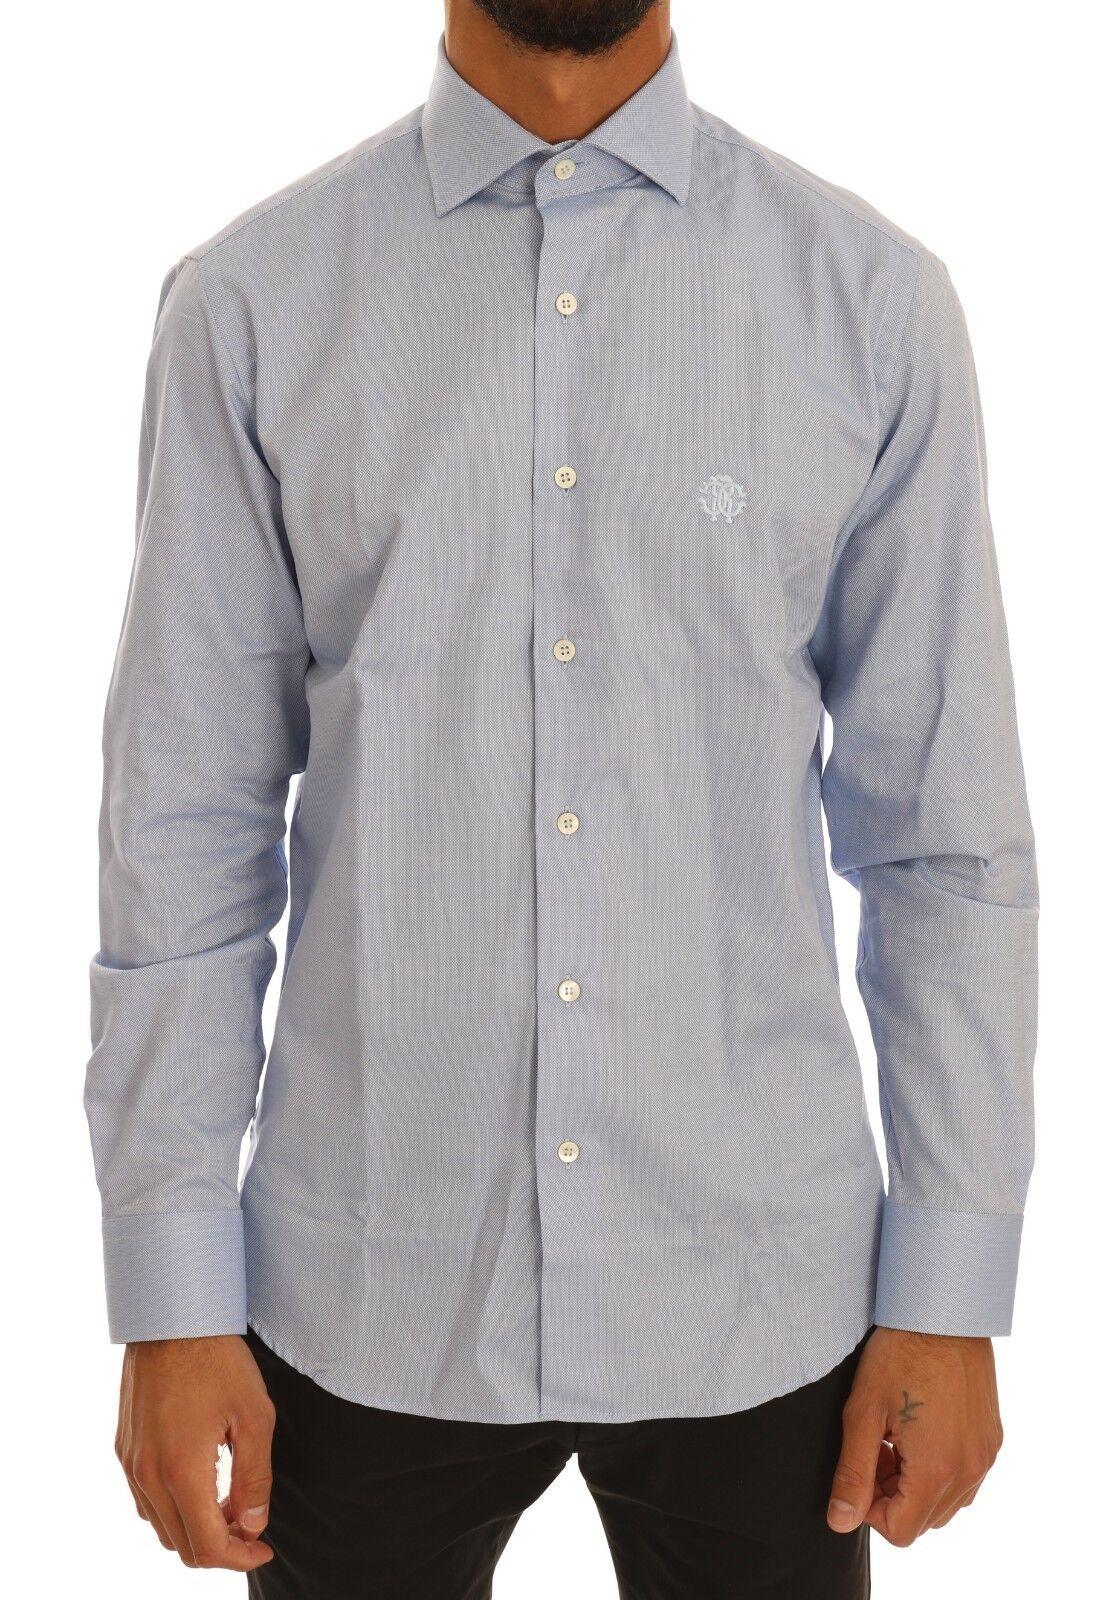 NEW  ROBERTO CAVALLI Shirt Dress Formal bluee Cotton Slim Fit IT40  US15.75 M